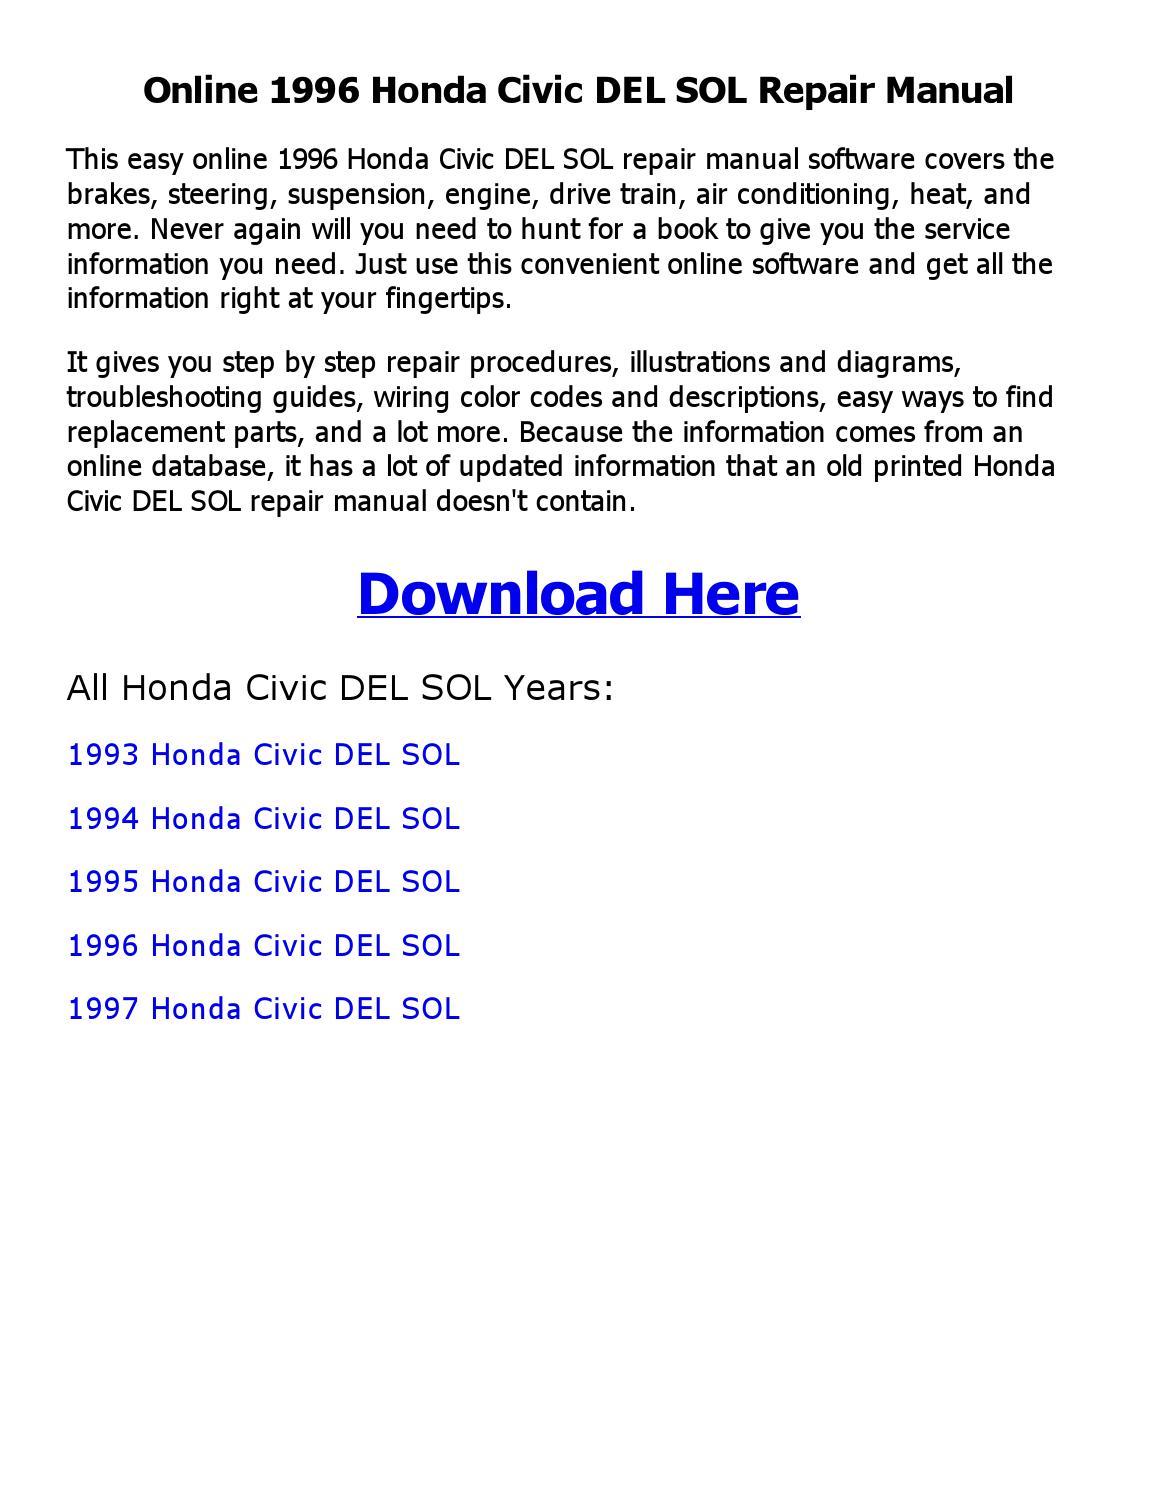 hight resolution of 1994 honda del sol service manual